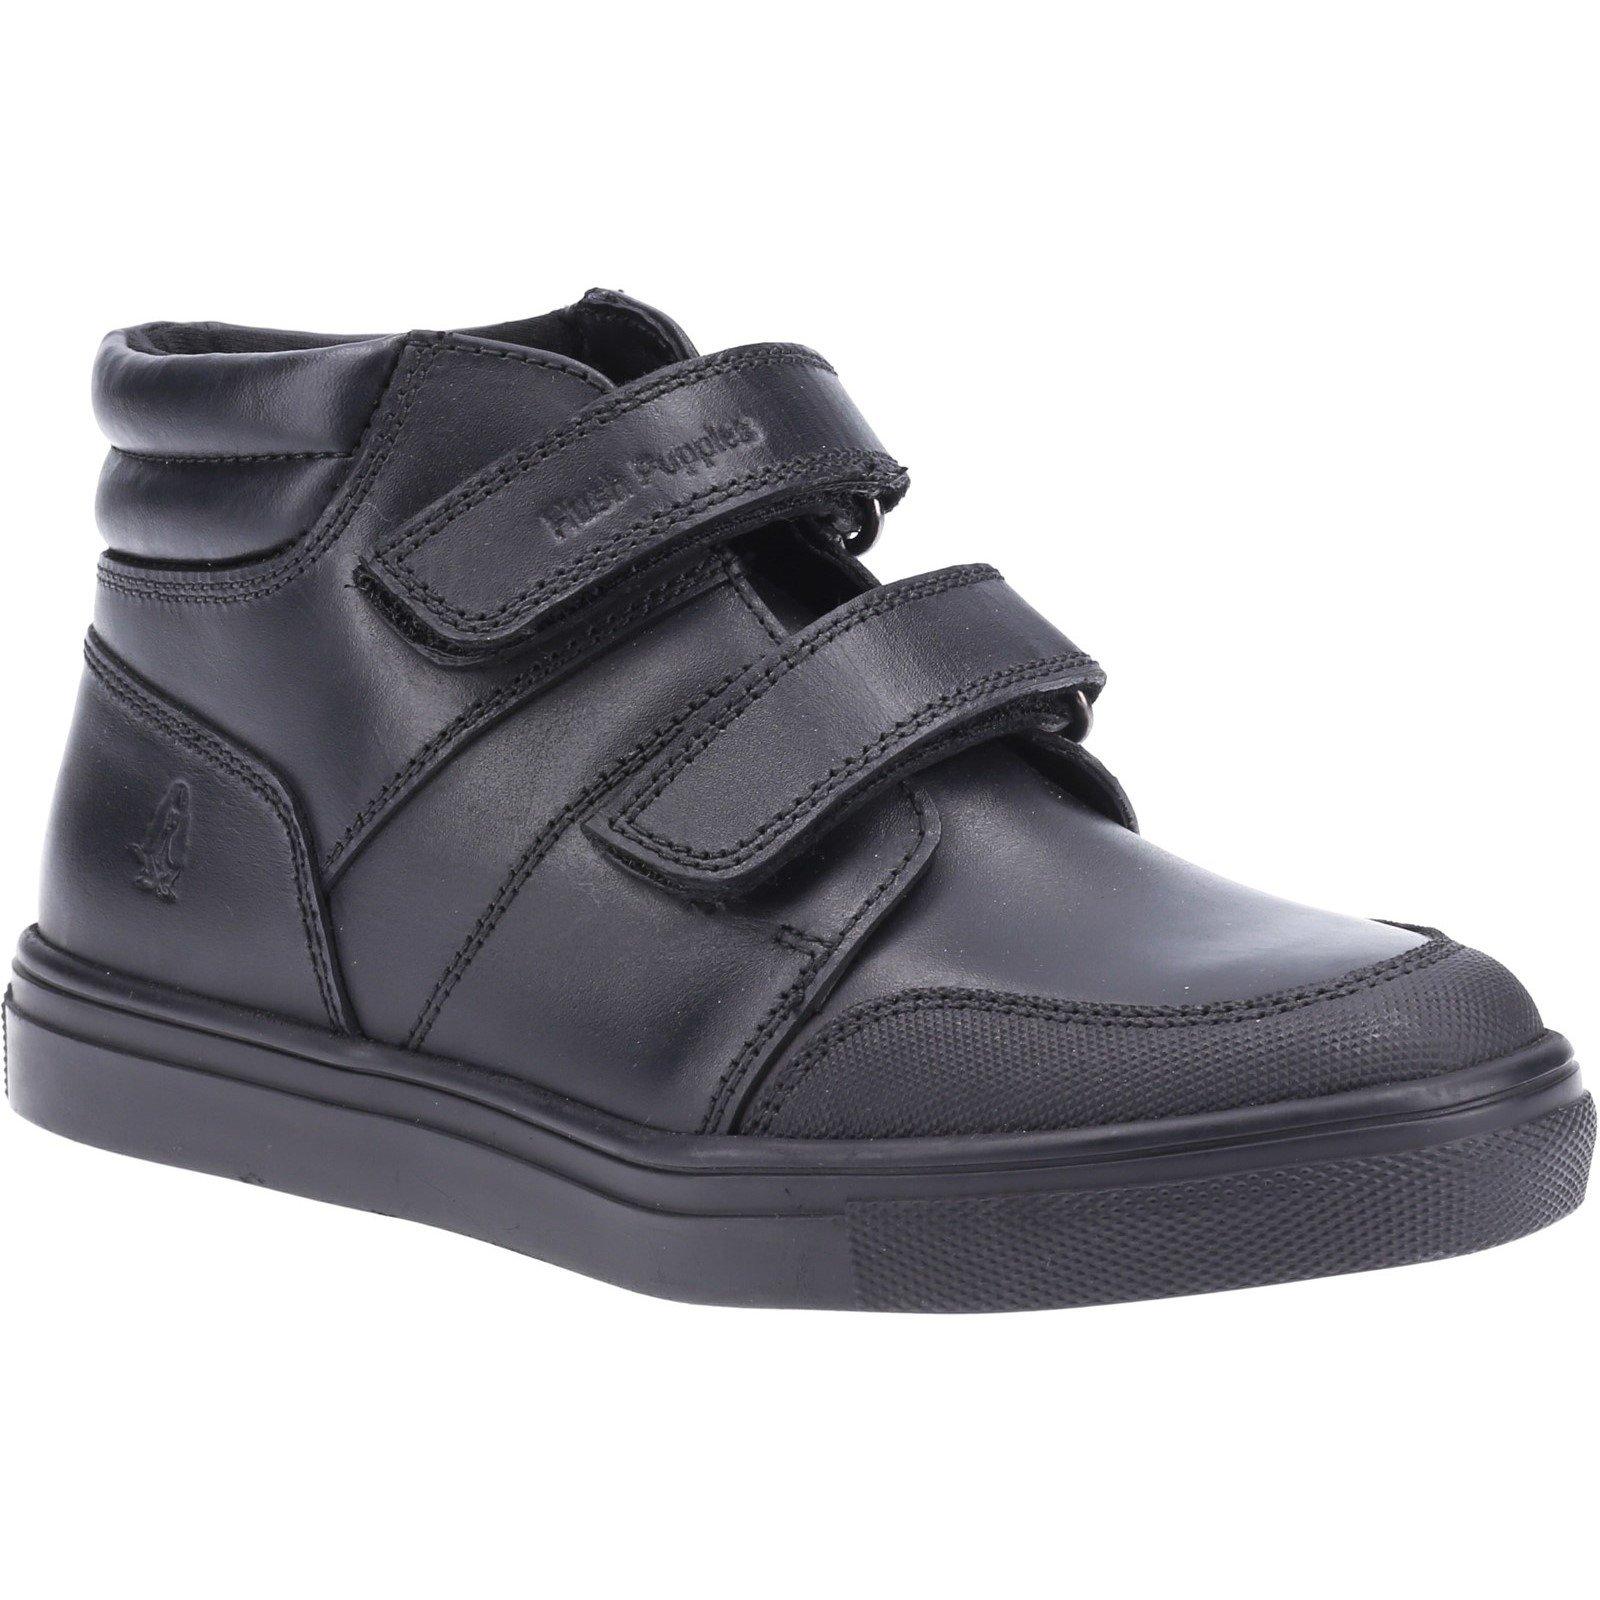 Hush Puppies Kid's Seth Junior Boot Black 32570 - Black 13